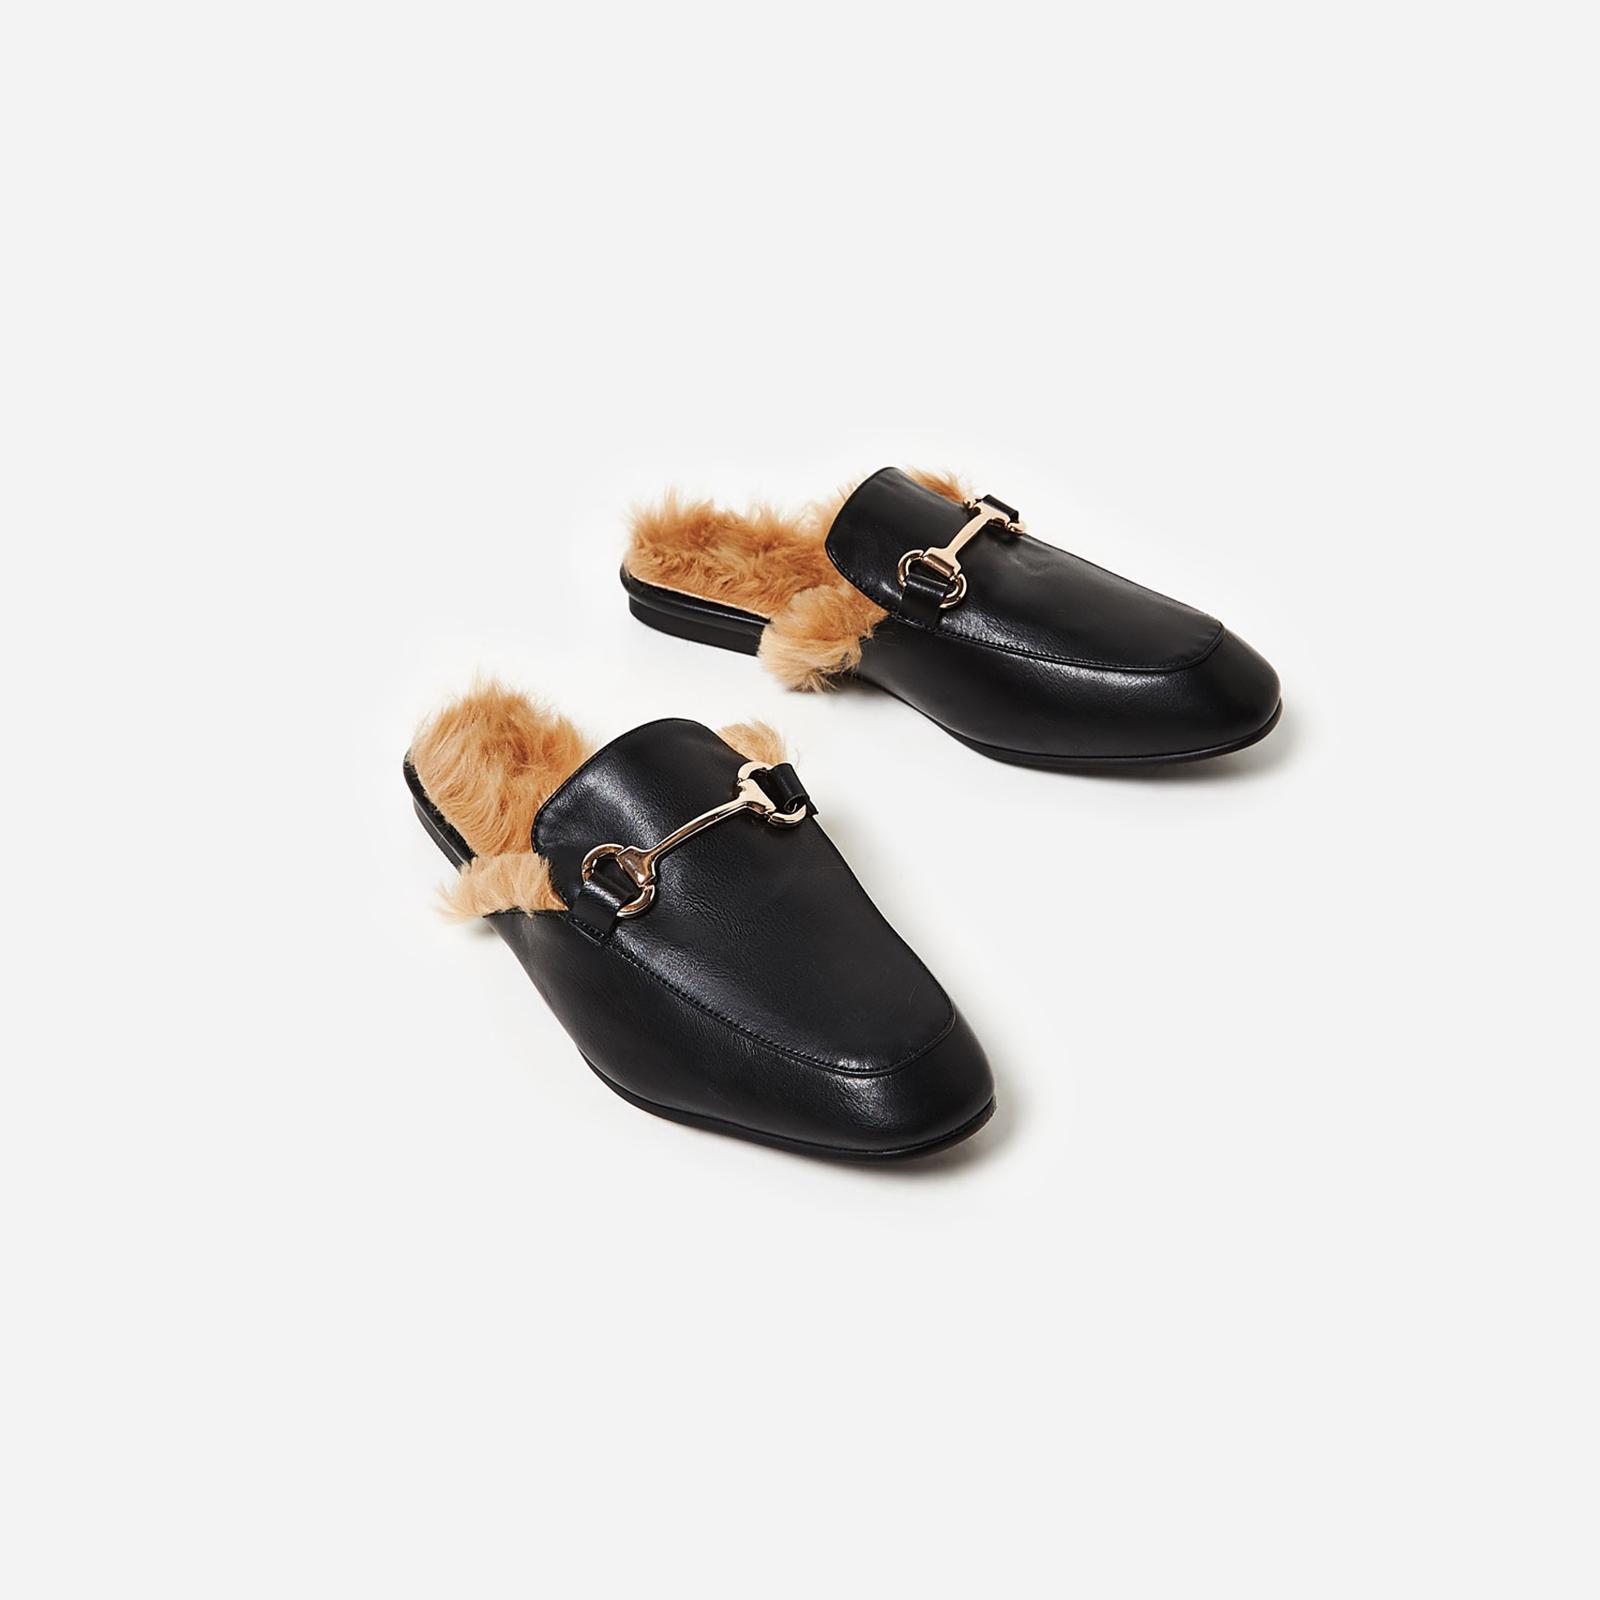 Leona Faux Fur Lined Flat Mule In Black Faux Leather Image 1